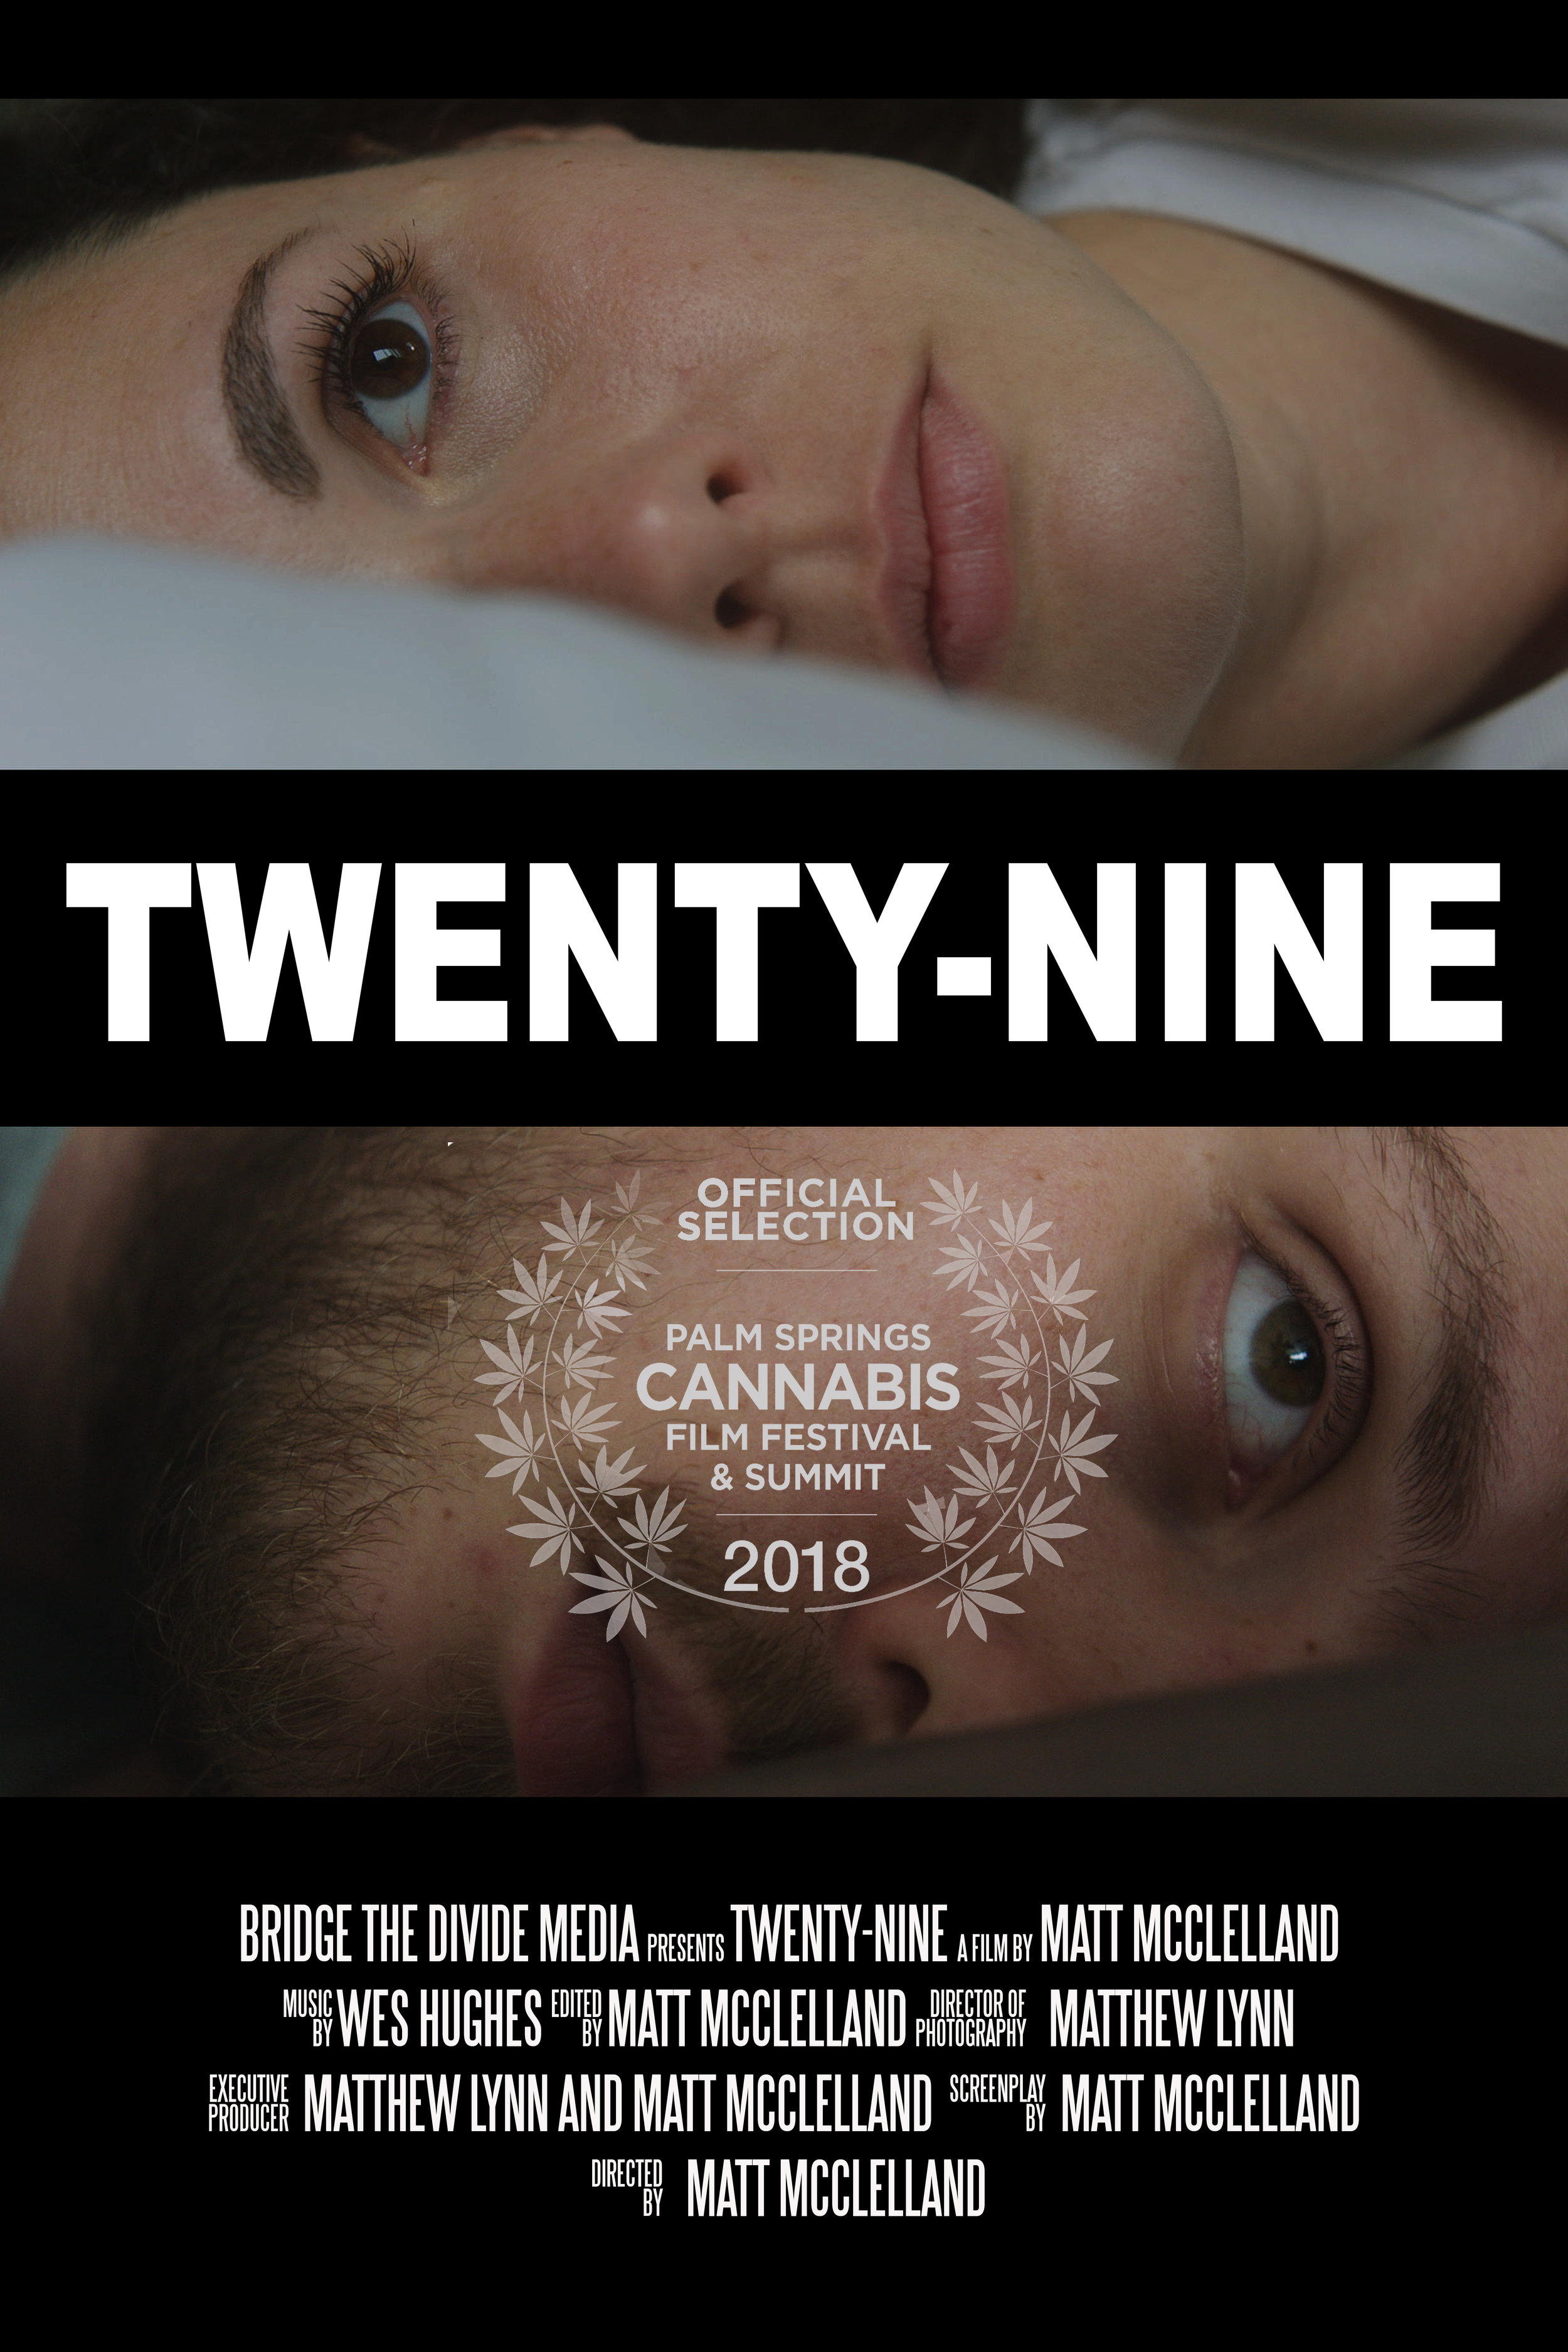 Twenty-nine poster with Laurel.jpg